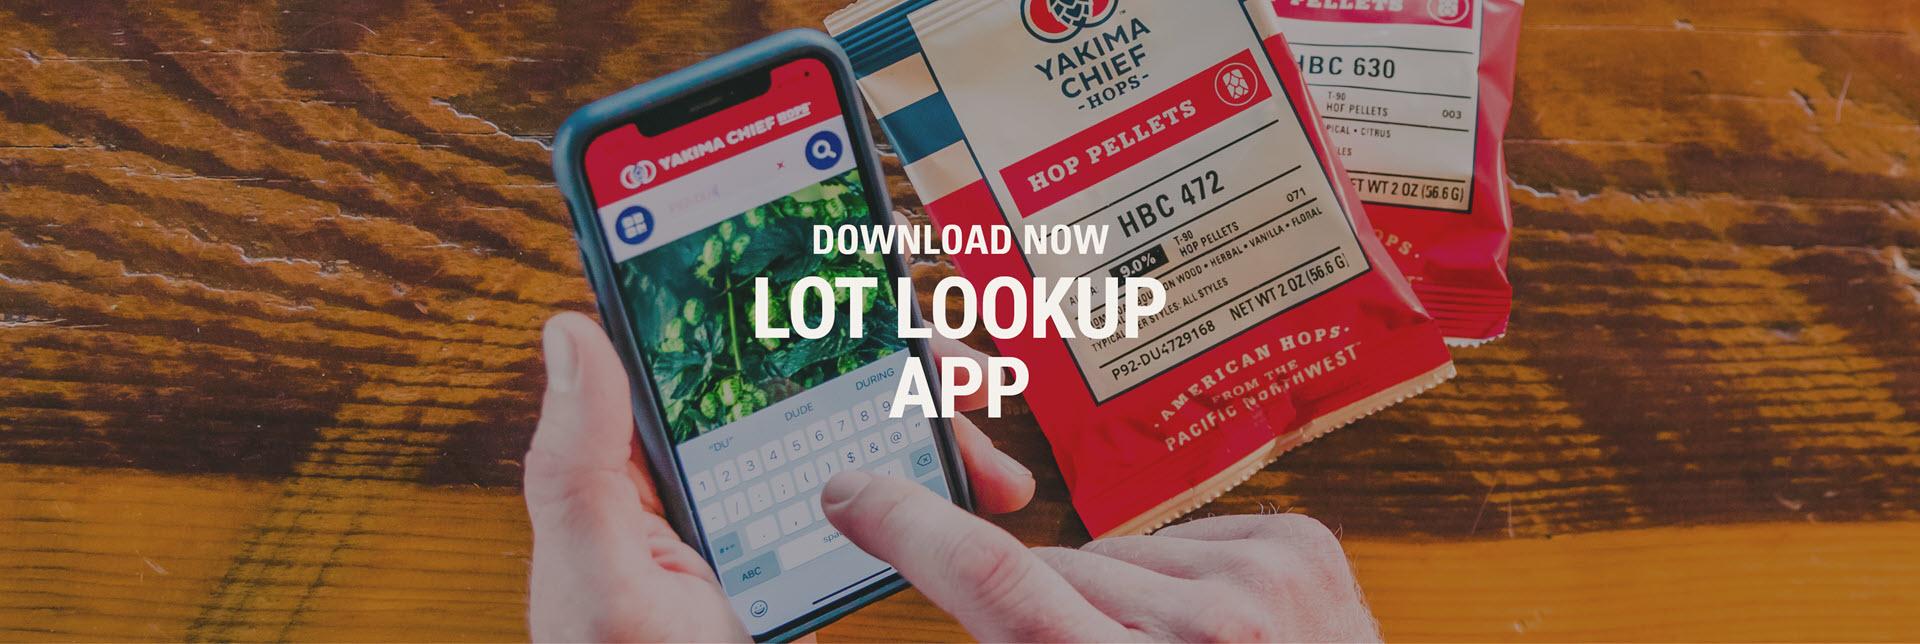 Lot Lookup App